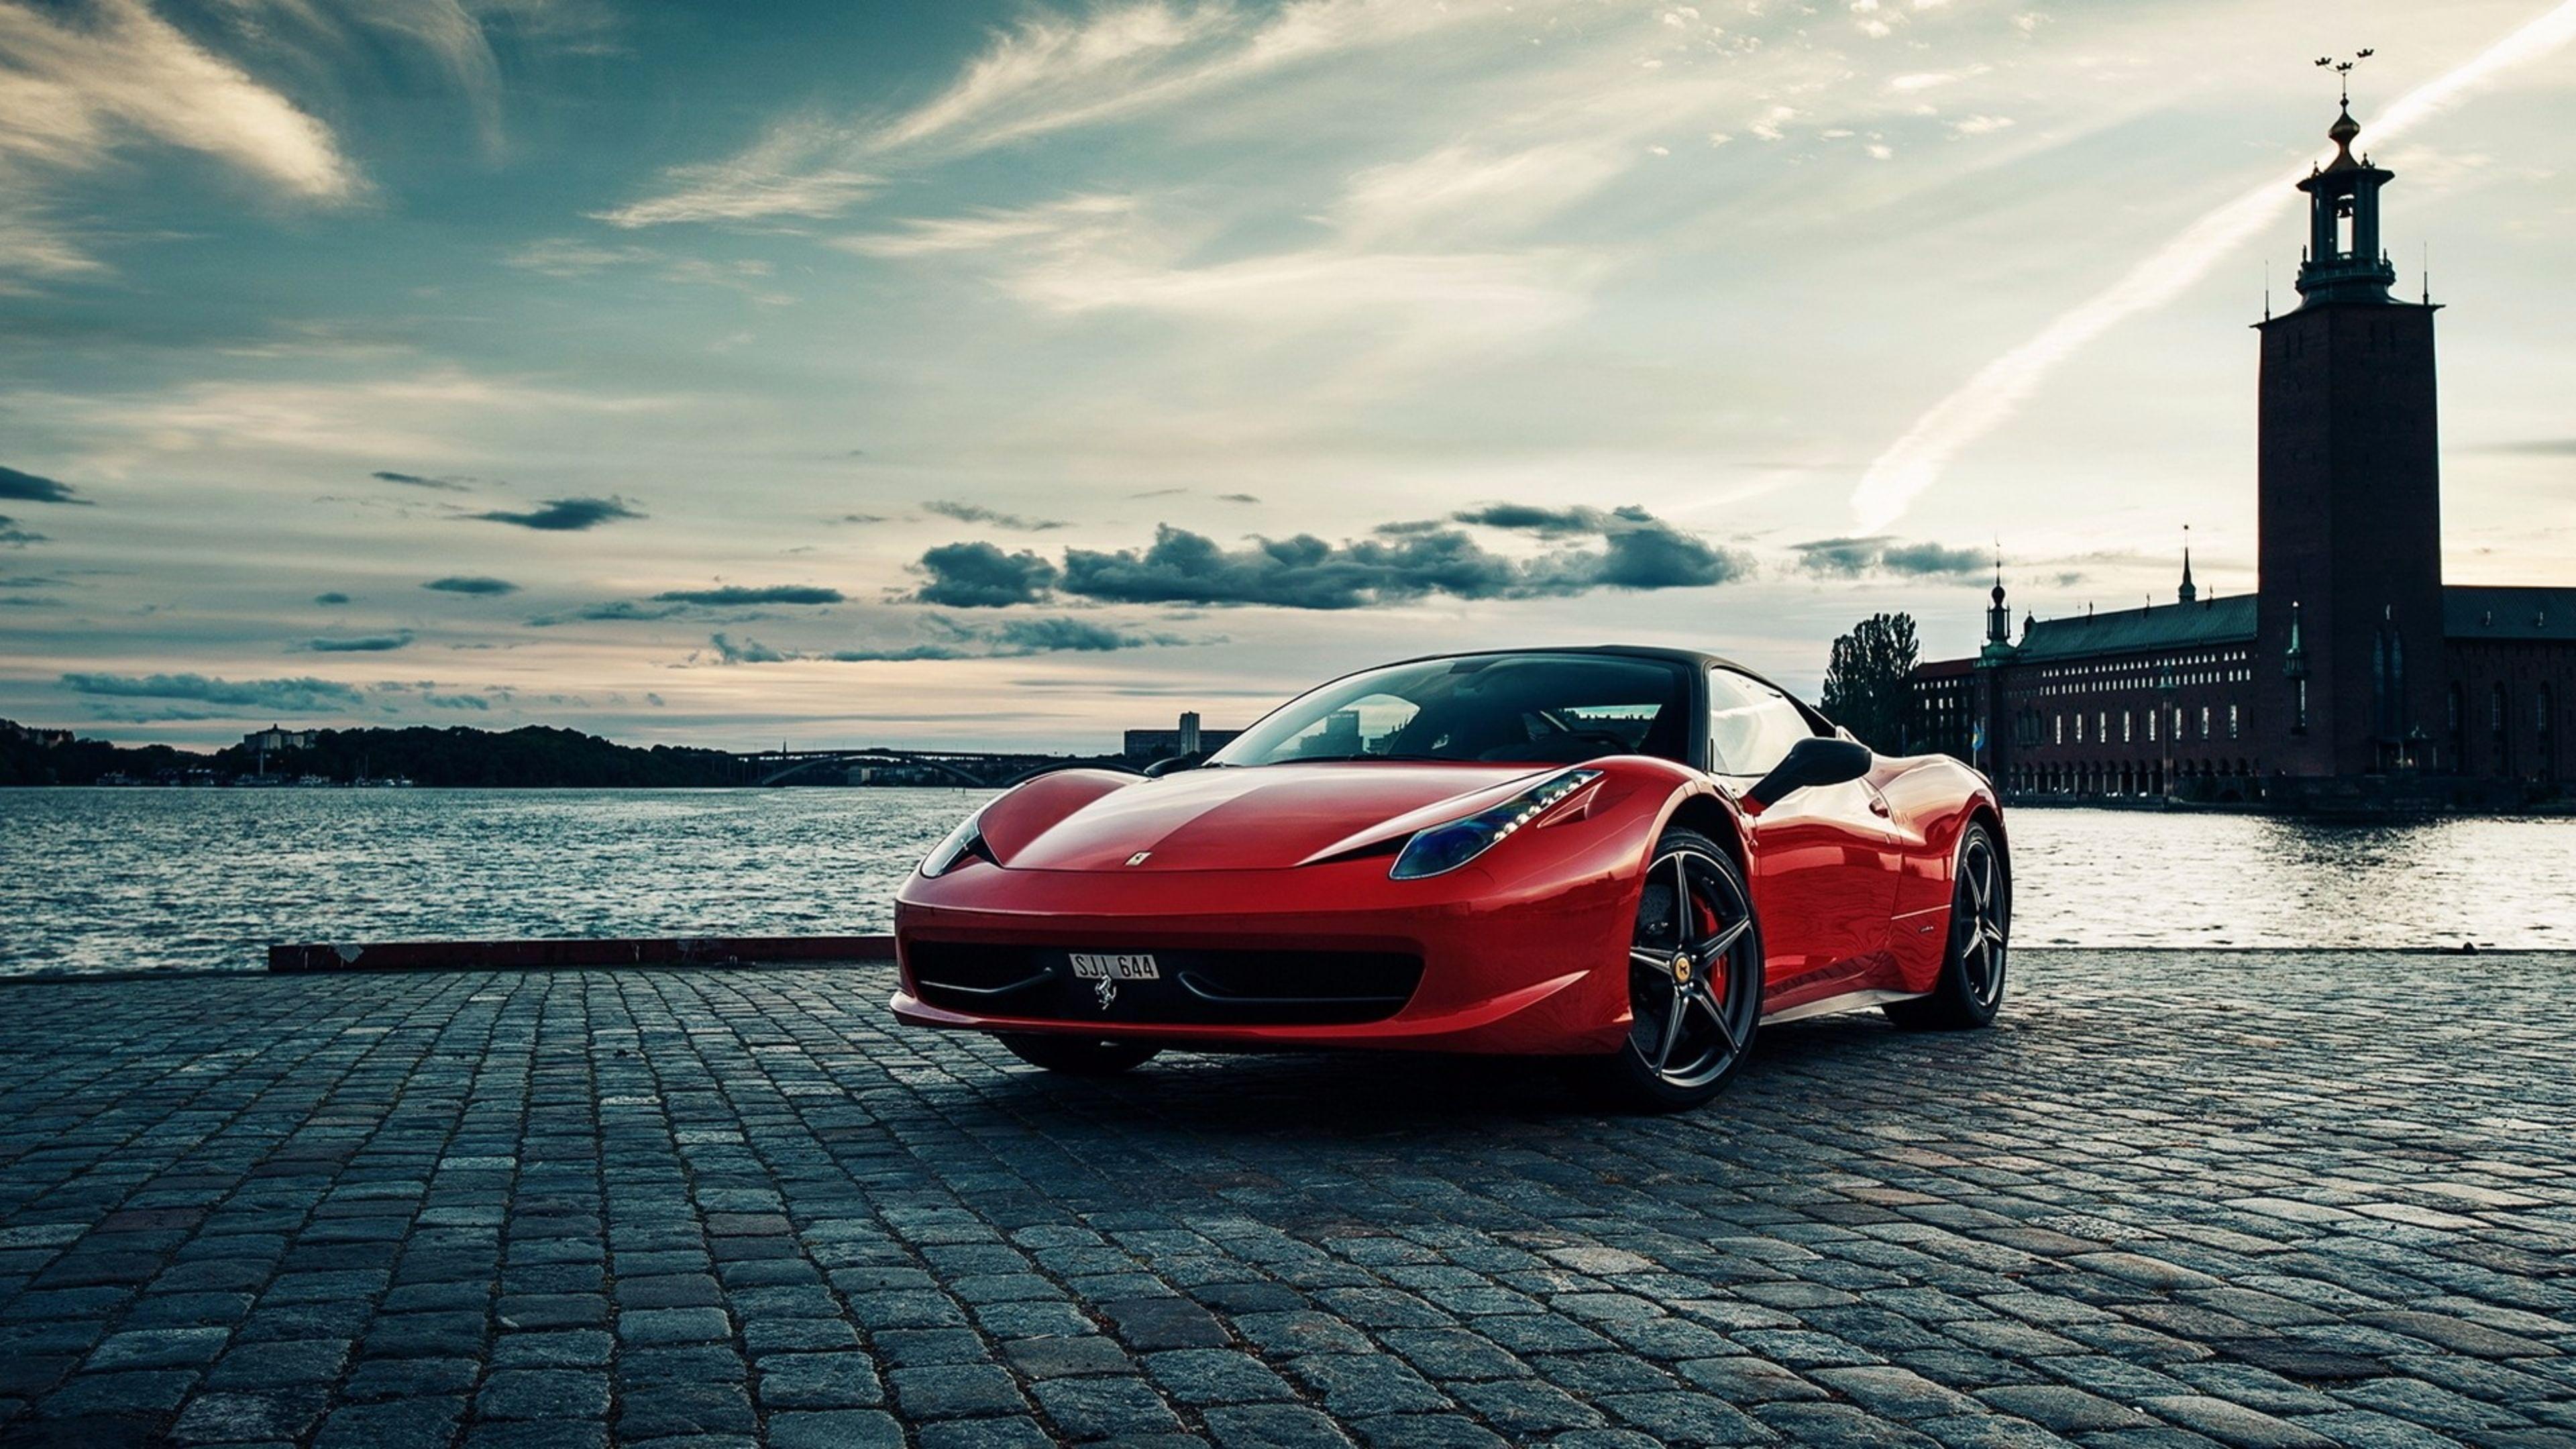 Ferrari 4k Wallpapers Wallpaper Cave